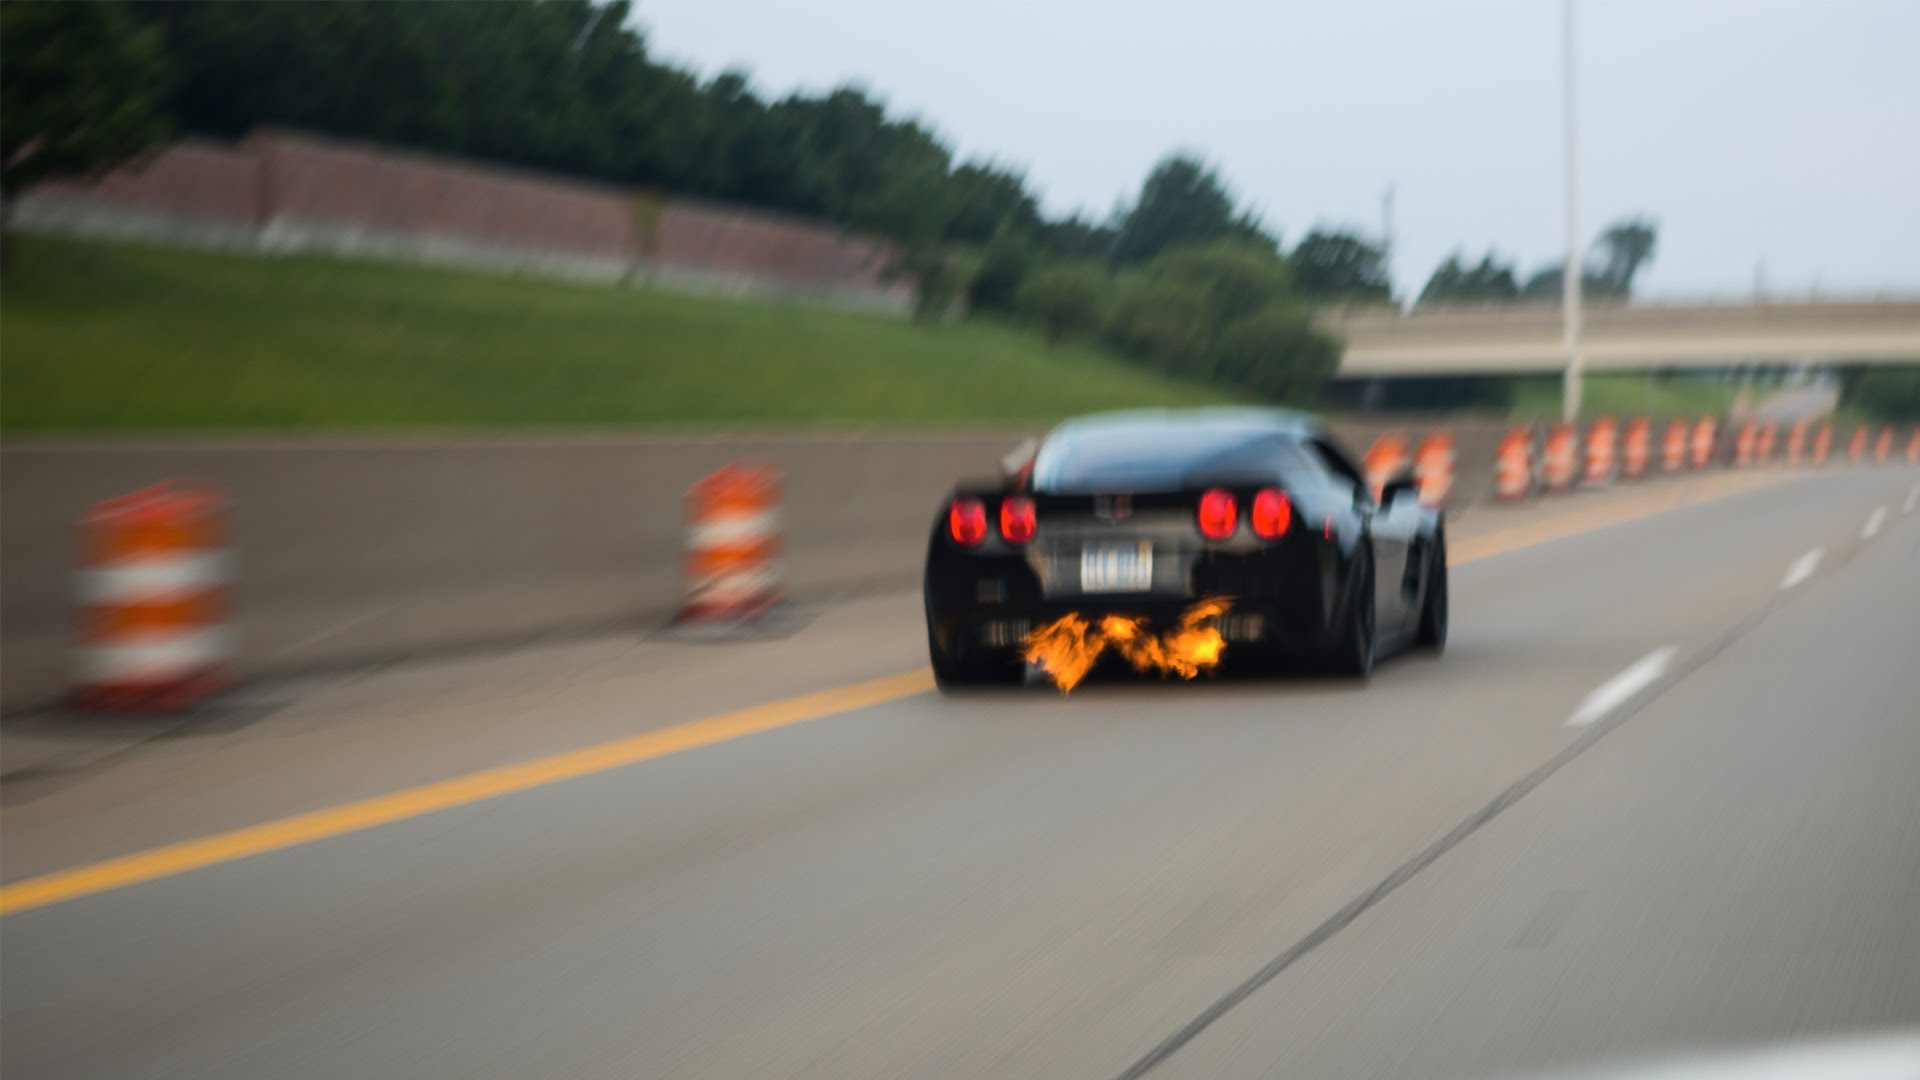 ZR1 Corvette Top Speed 2013 Michigan Mile - VetteTube - Corvette Videos